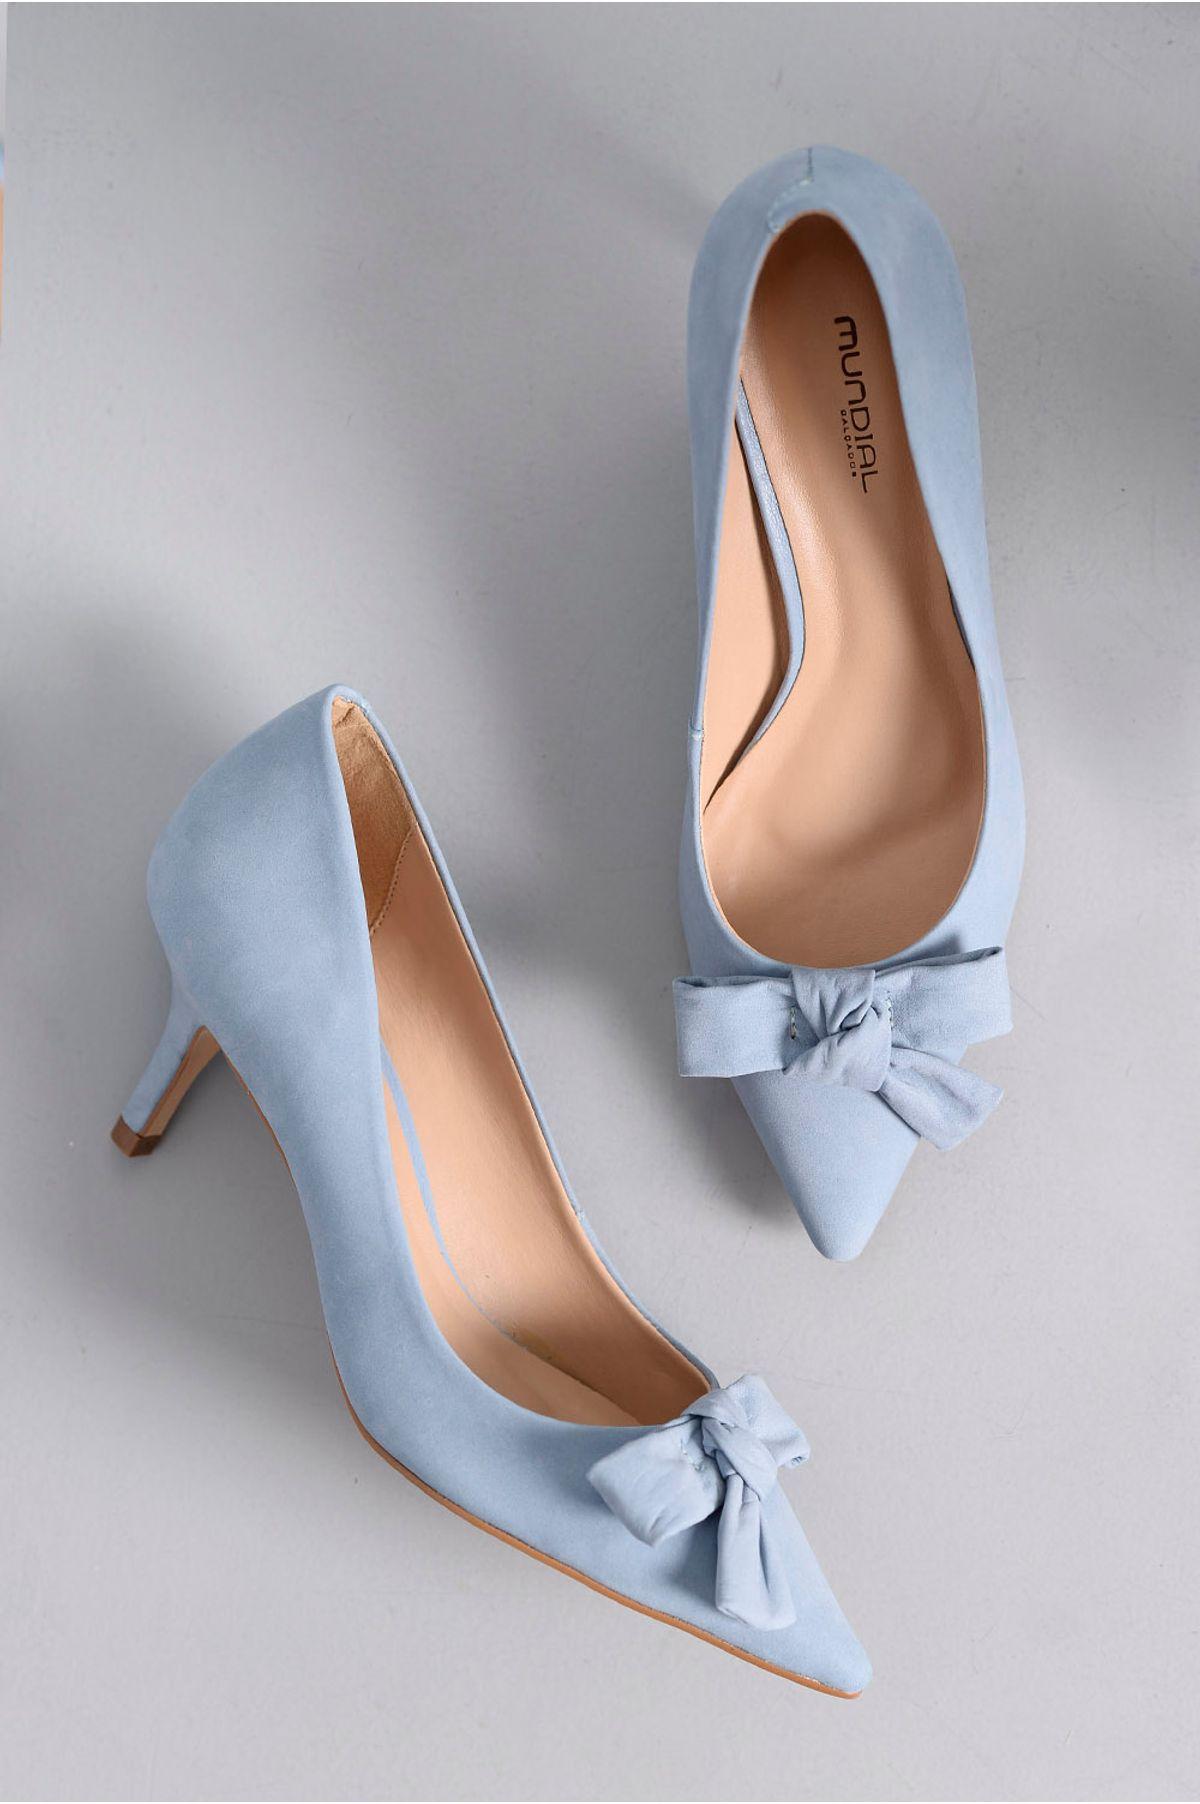 d095f0bd14 Scarpin Feminino Salto Médio Edith Mundial NB - AZUL - Mundial Calçados